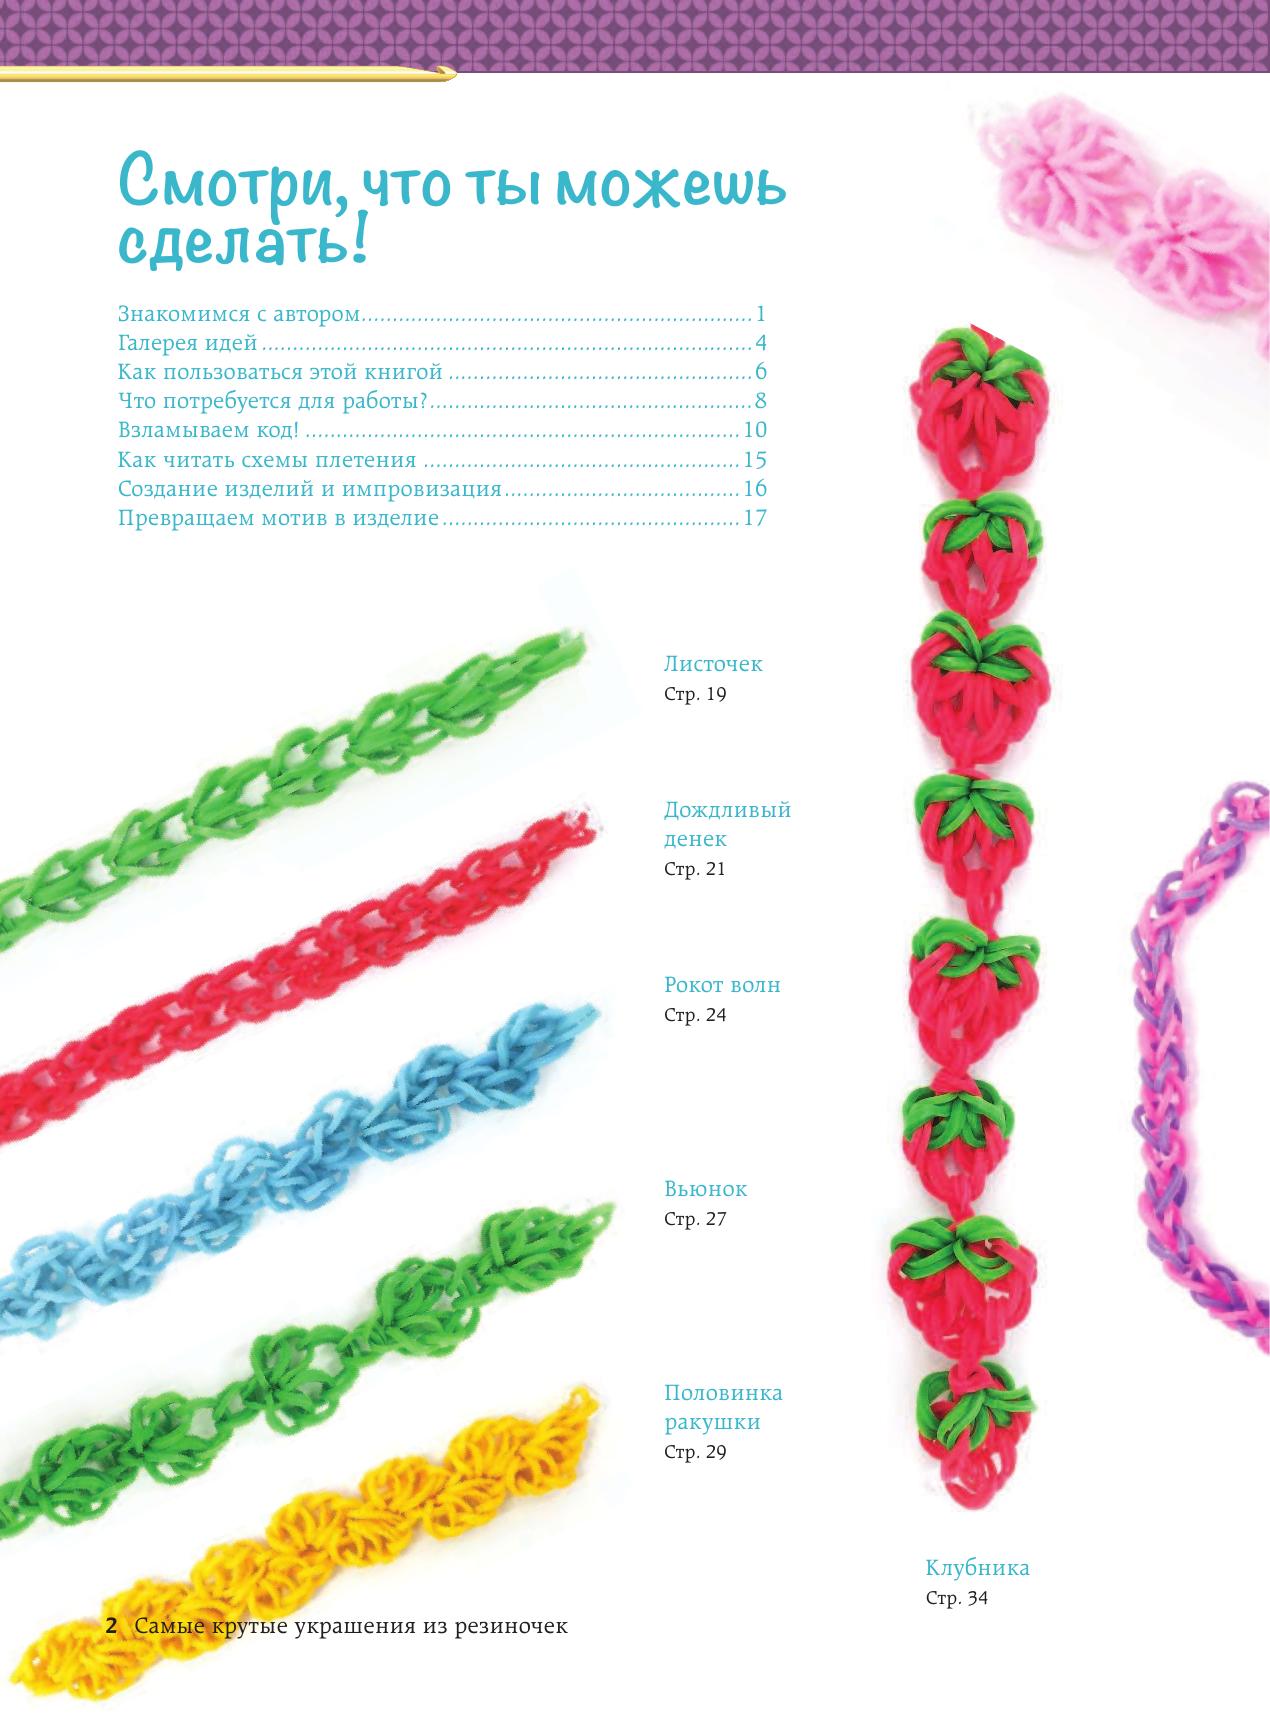 Схемы плетения, как плести браслеты из резинок Rainbow Loom